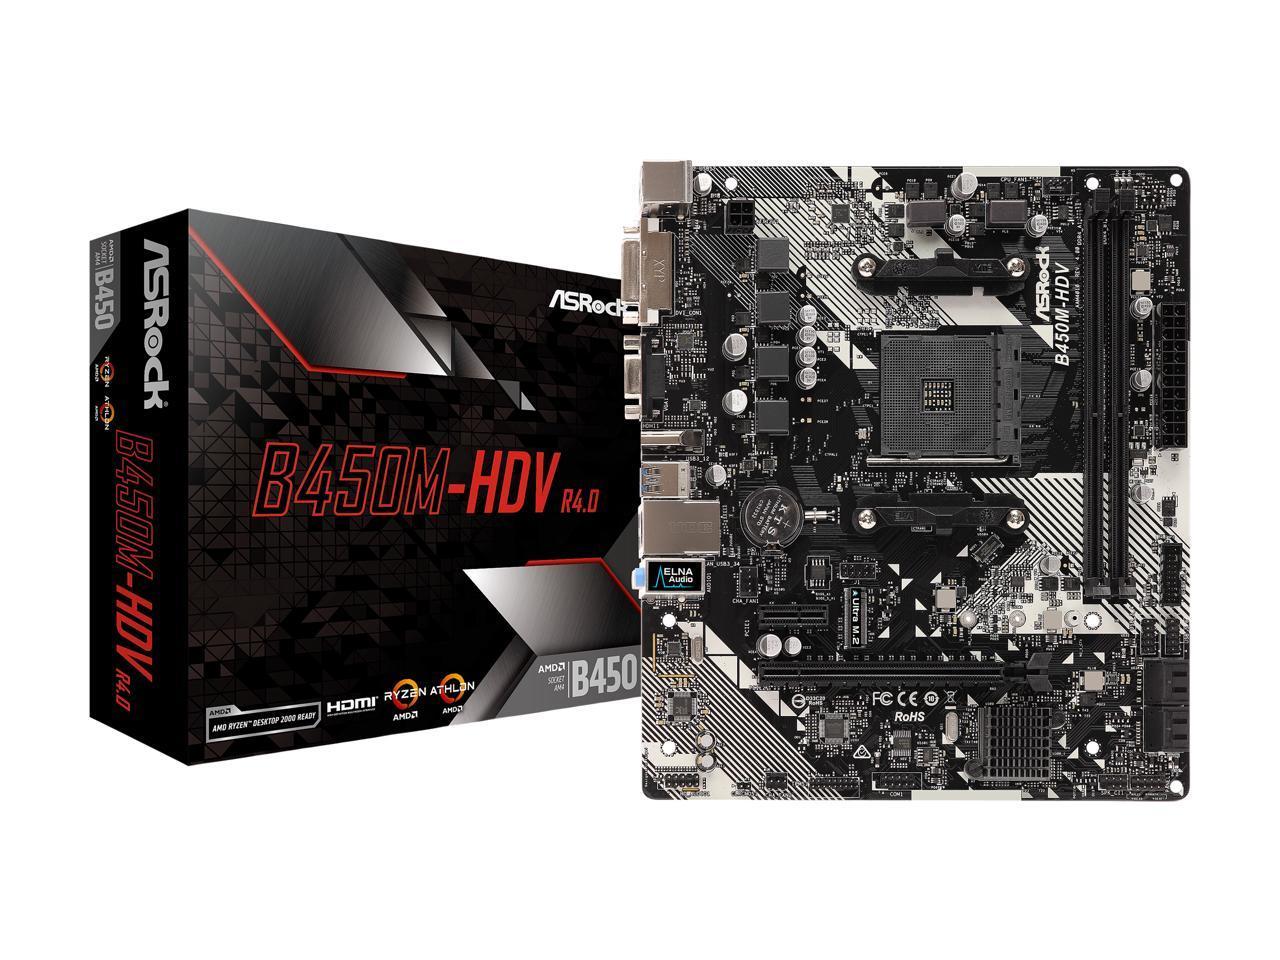 ASRock B450M-HDV R4.0 Motherboard